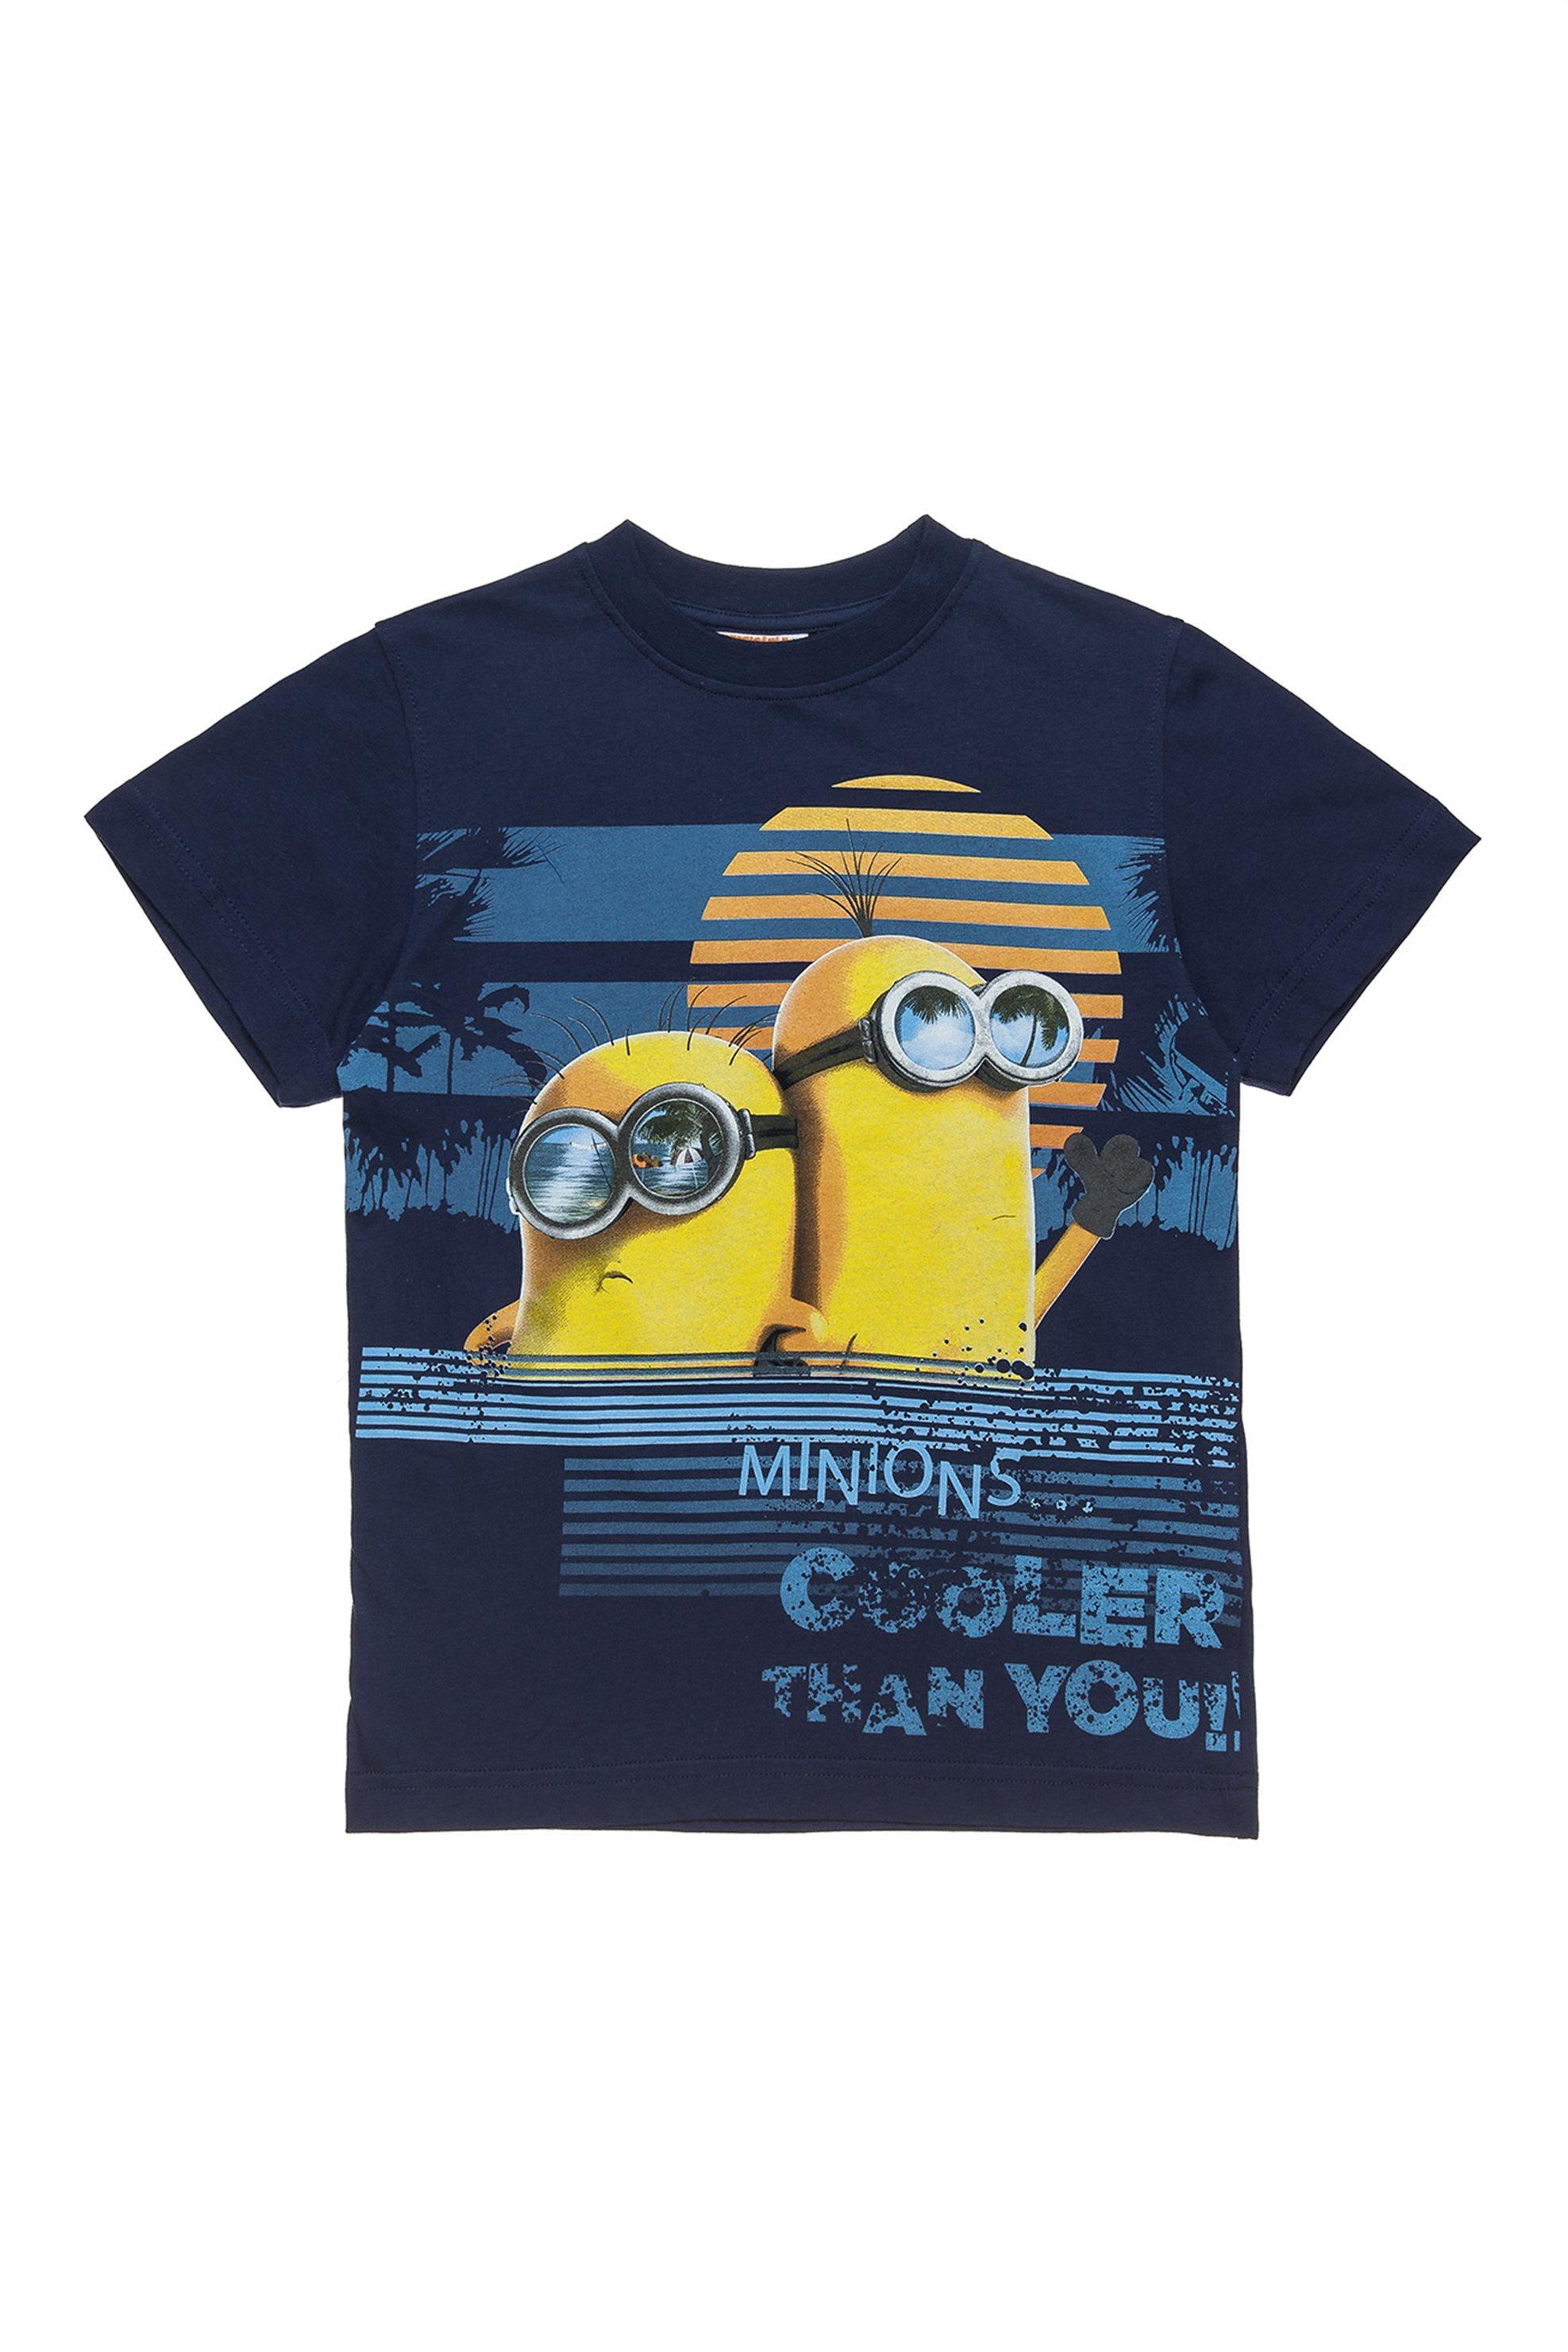 3d89d4f0721 Notos Alouette παιδικό T-shirt με τύπωμα μπροστά Minions (5-14 ετών) -